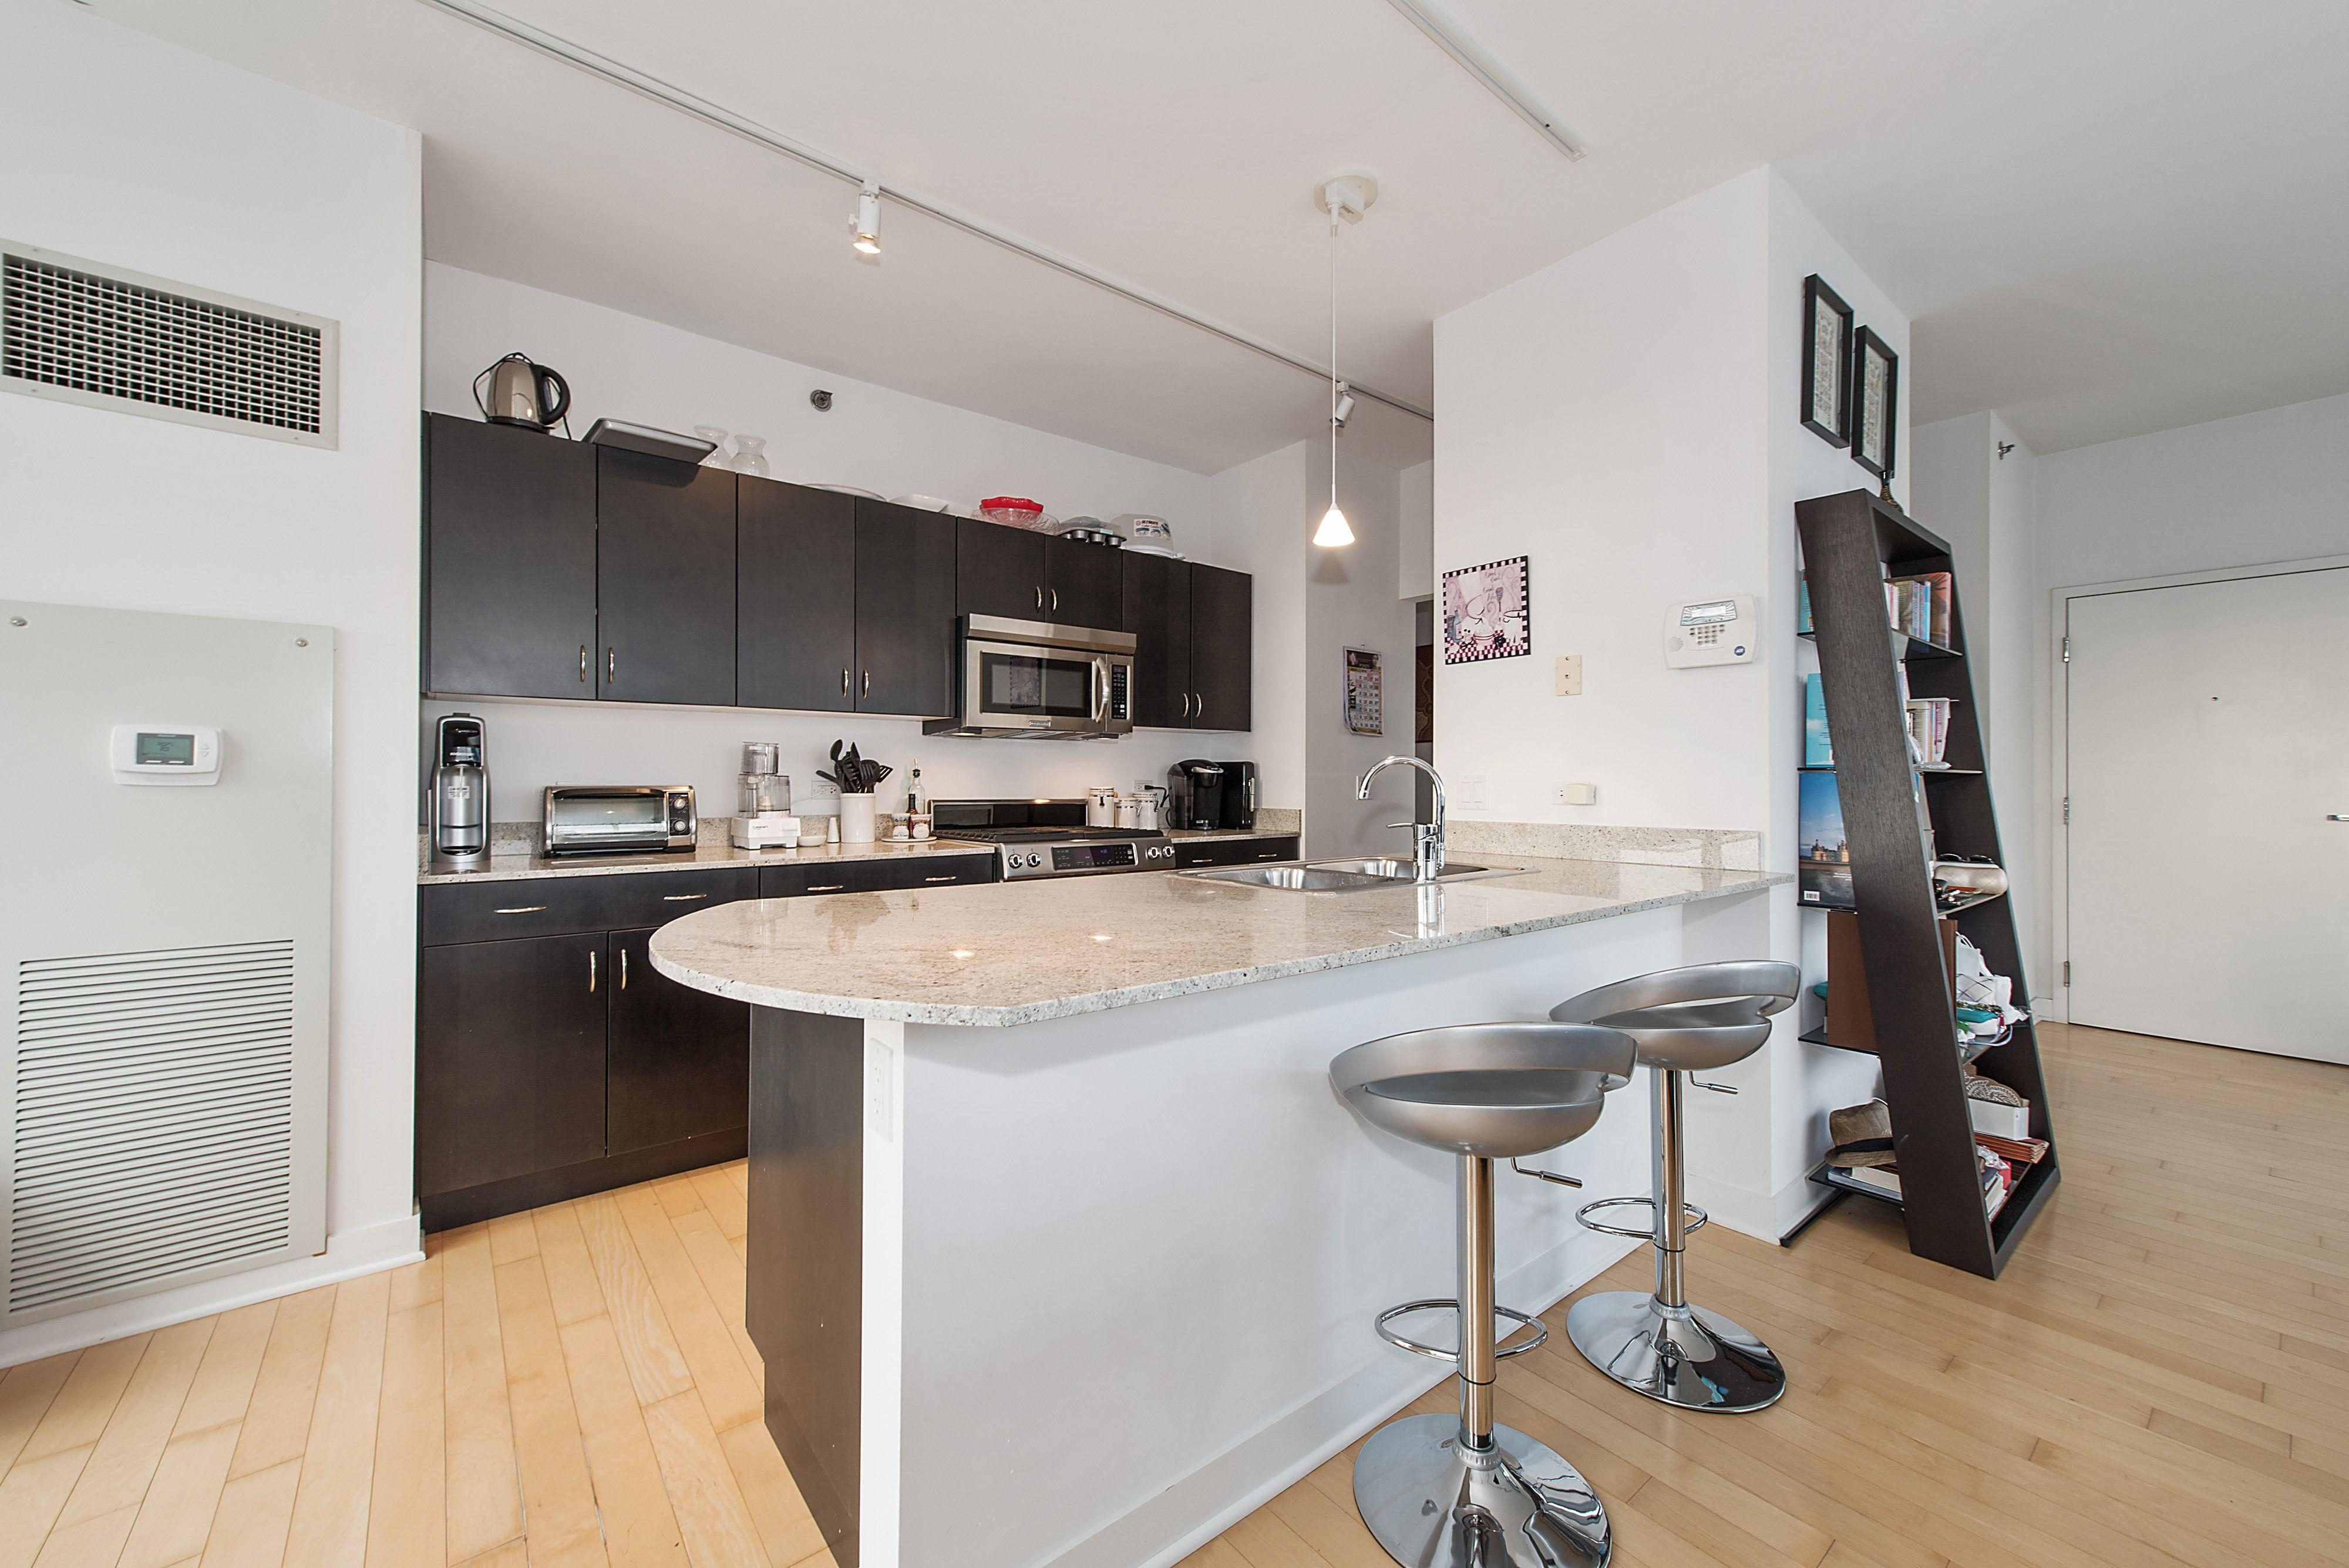 Modern kitchen with hardwood floors black cabinets pendant